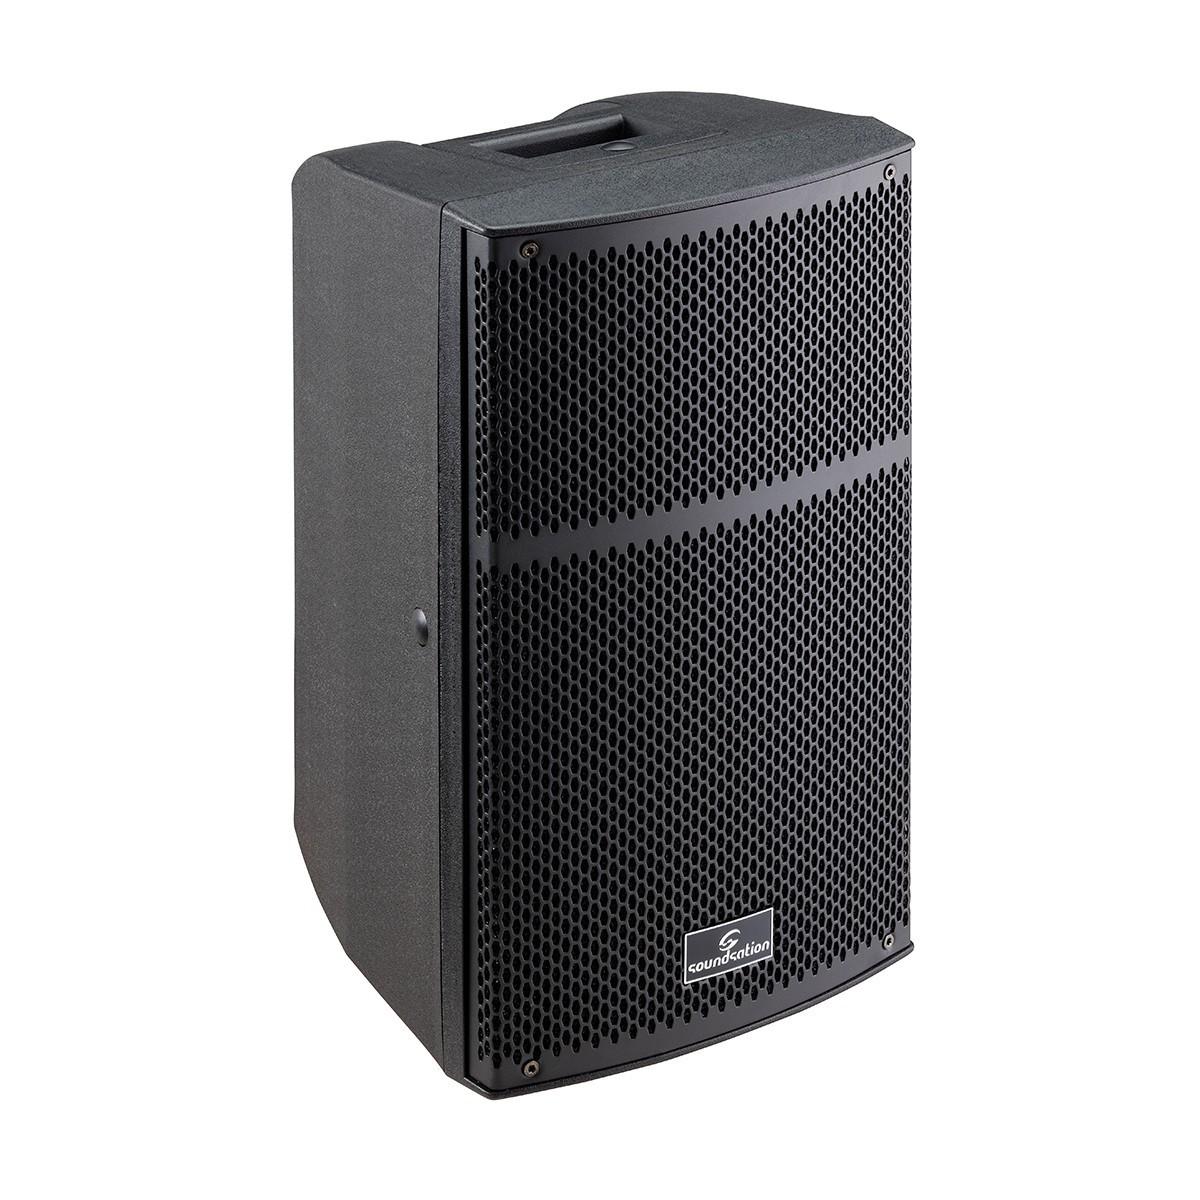 SOUNDSATION HYPER TOP 10A - DIFFUSORE BI-AMP SOUNDSATION HYPER TOP 10A 500W CLASSE D